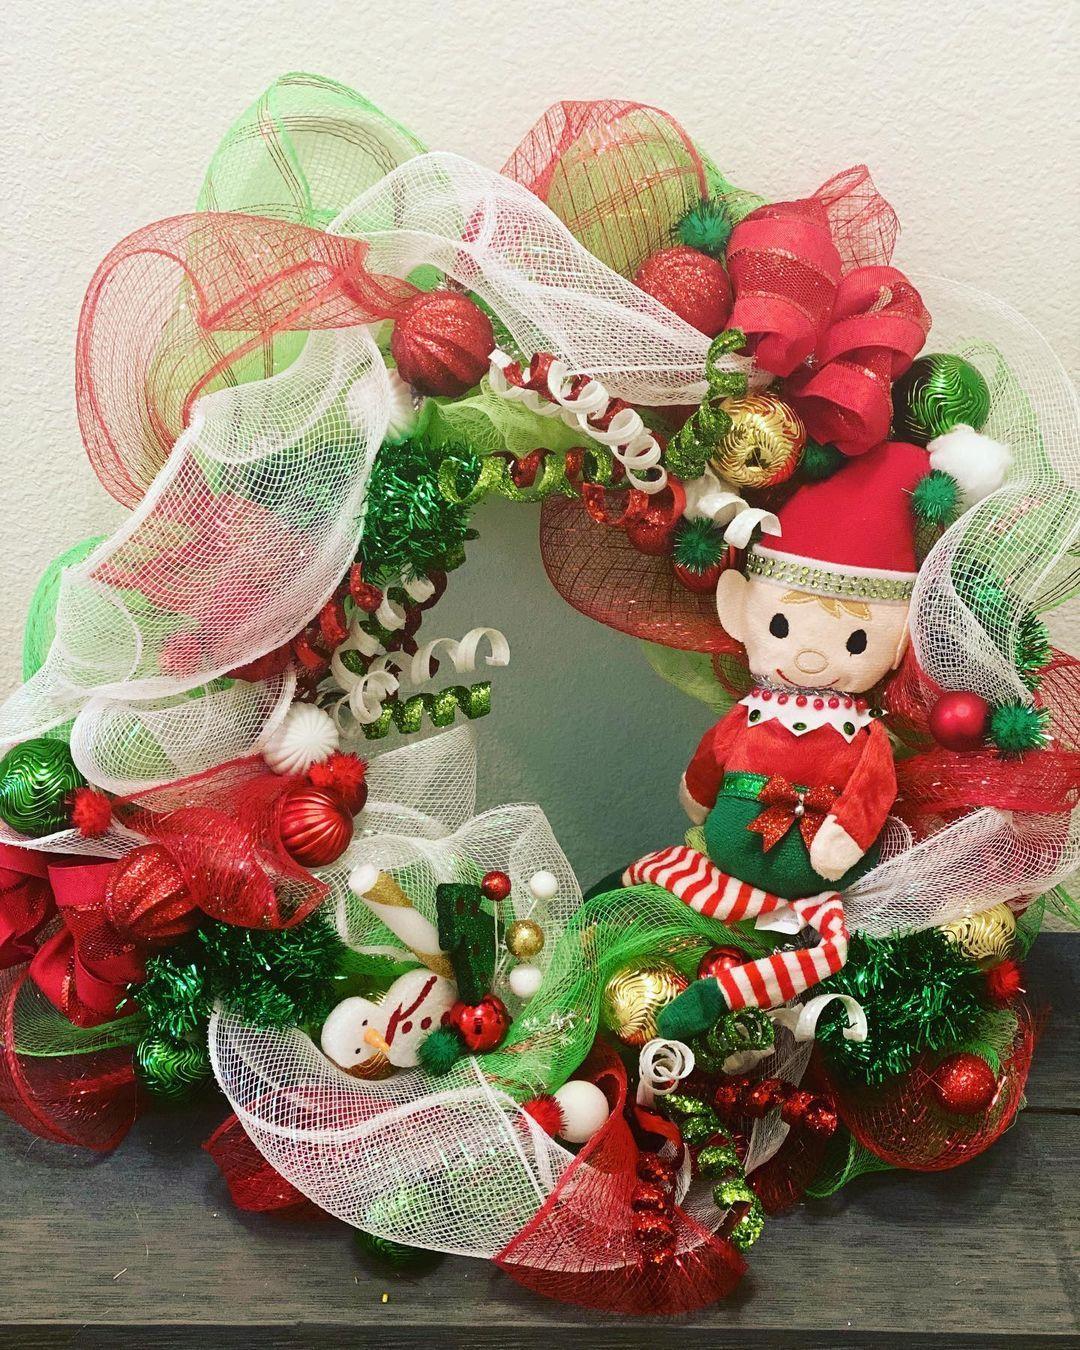 Just Elfing Around Wreath Christmasdecor Doordecor Christmaswreath Crafter Homedecor Elfontheshelf Elfdecor Hol In 2020 Christmas Wreaths Holiday Decor Holiday